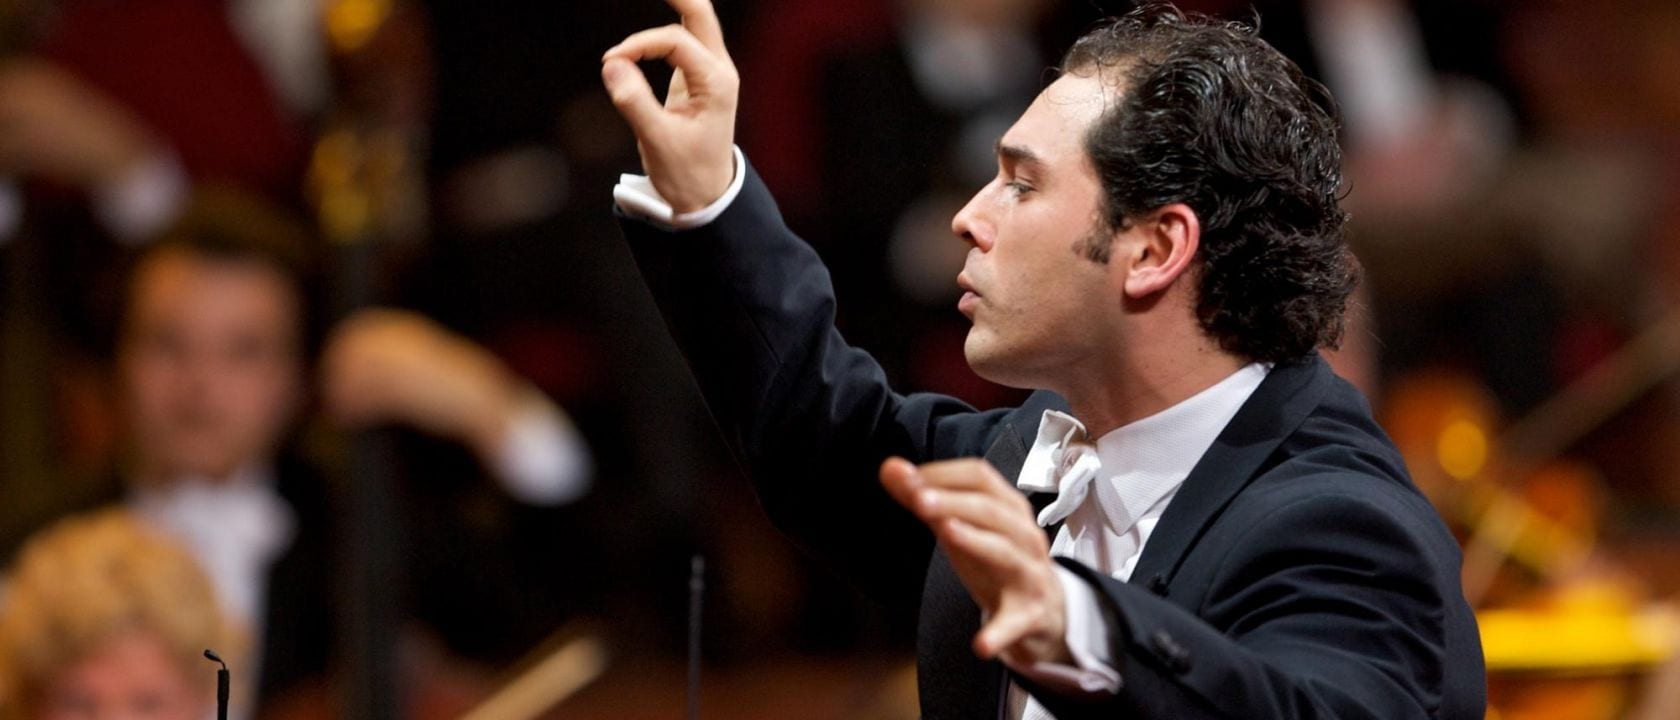 Tugan Sokhiev Dirigent